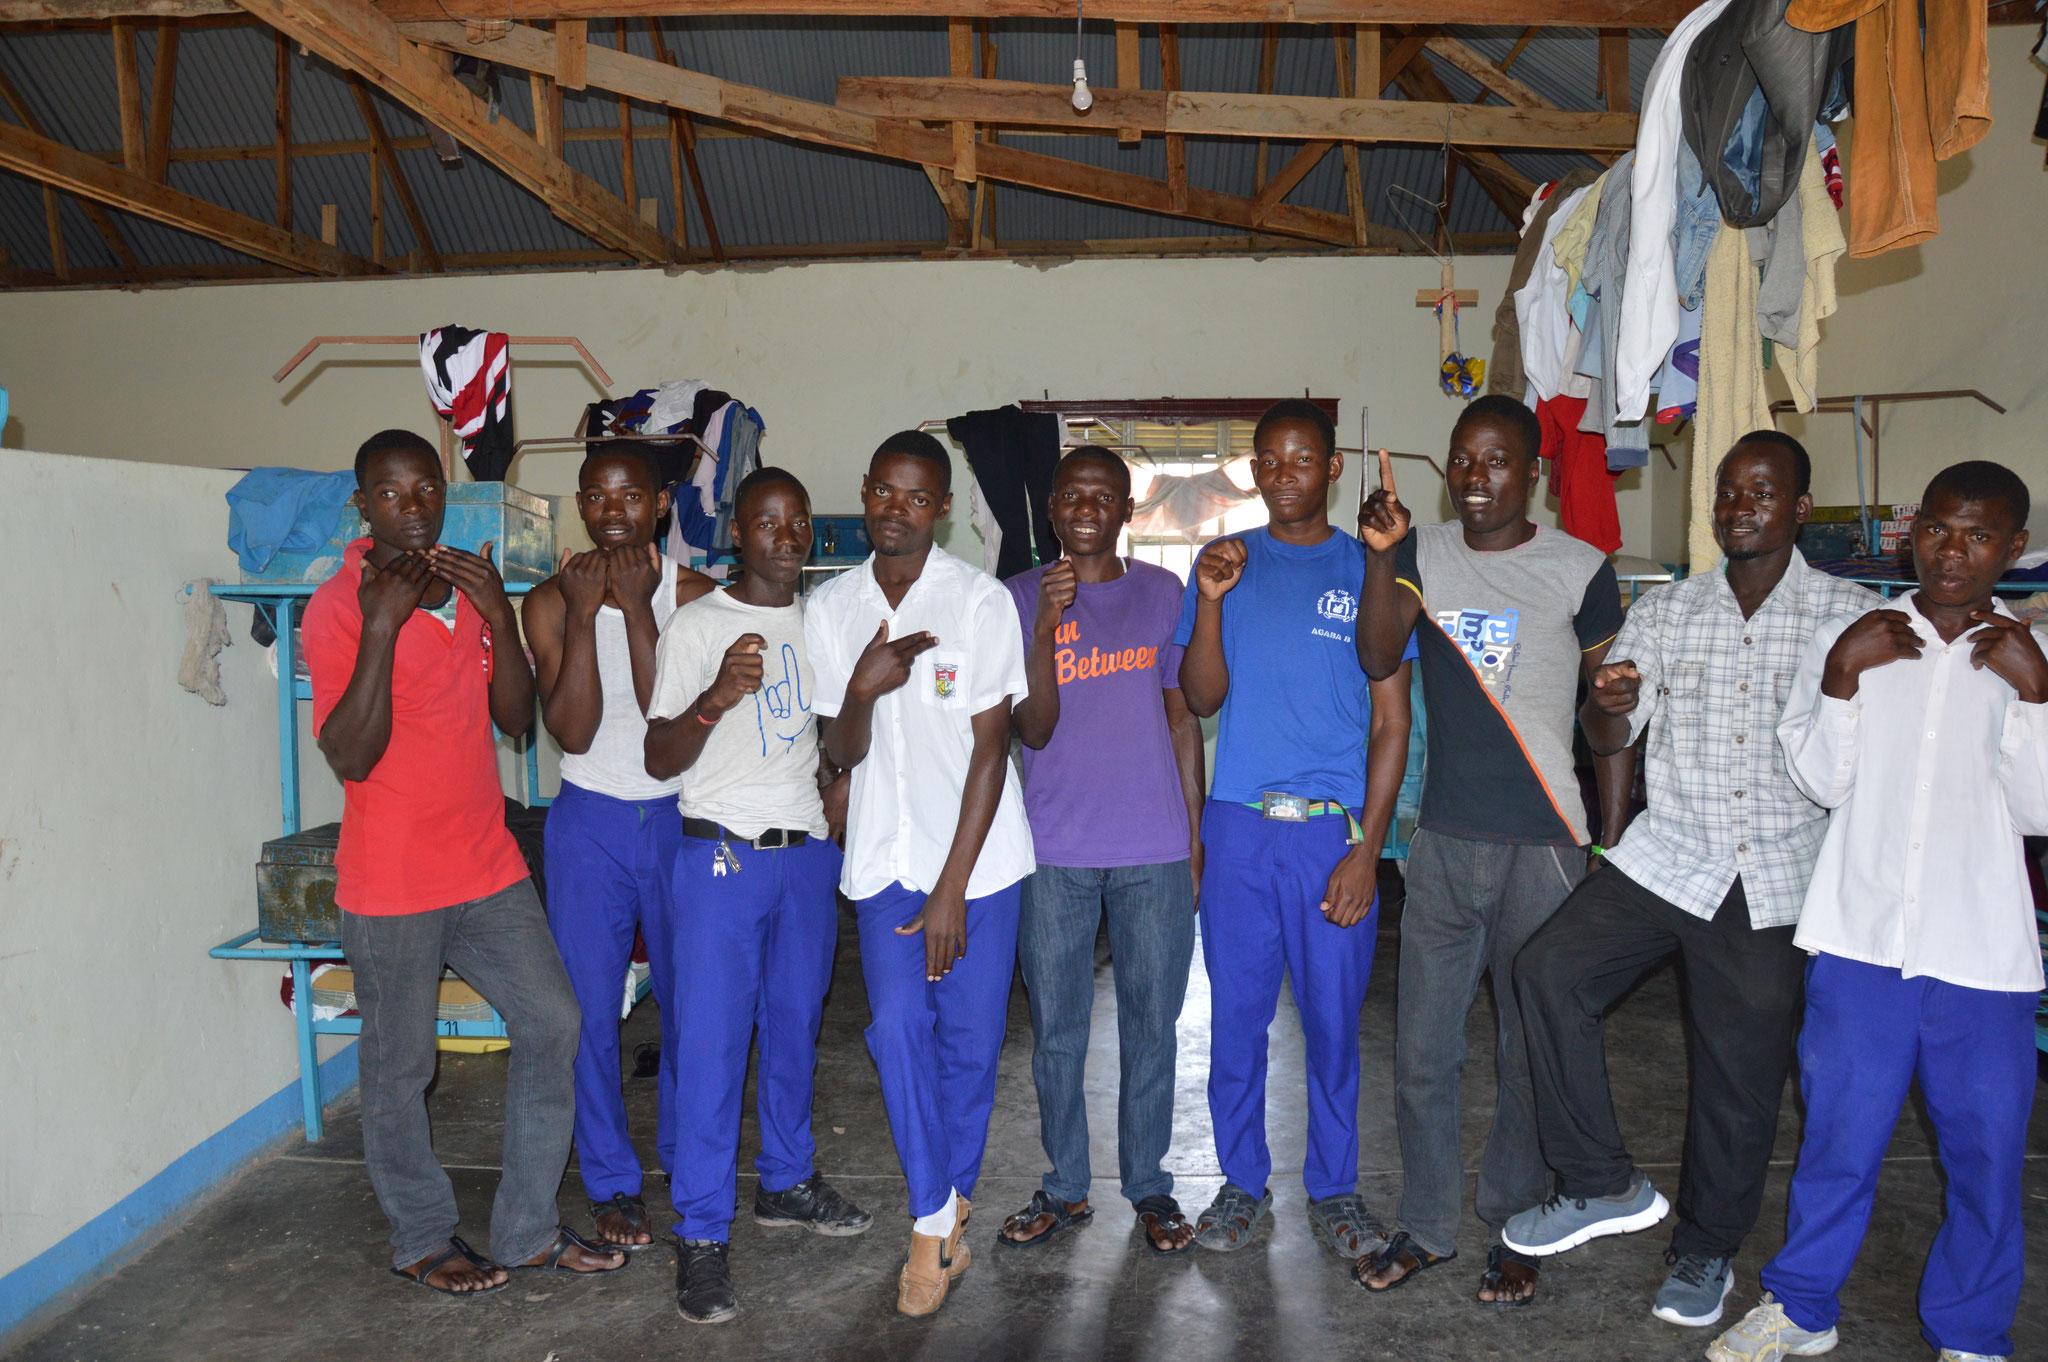 Jungs in Isingiro im Neubau Jungenschlafsaal